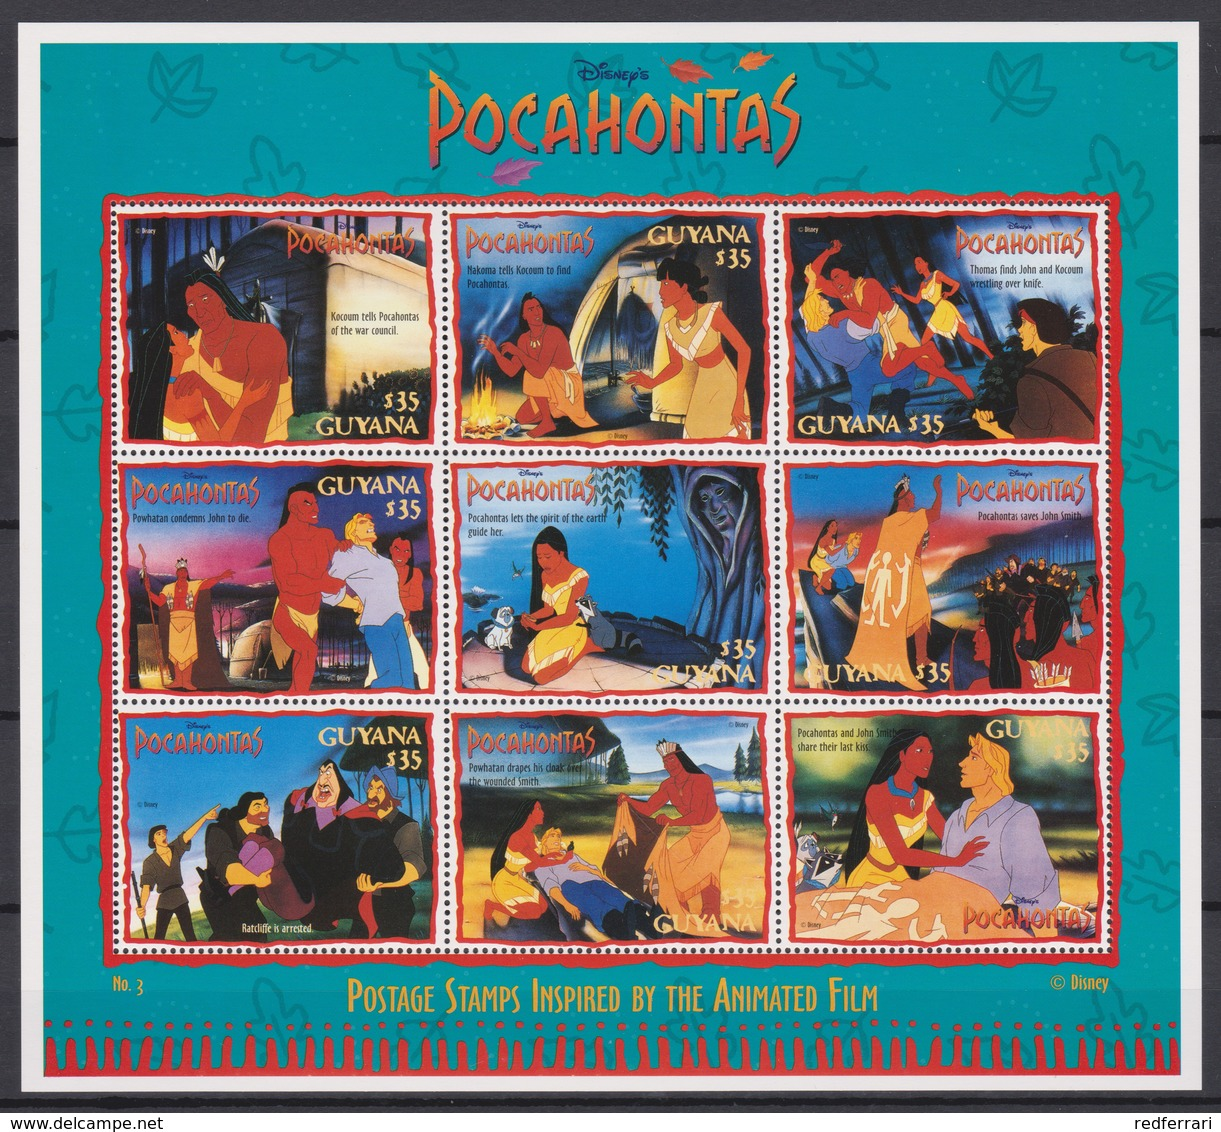 2327  WALT DISNEY - GUYANA ( POCAHONTAS) Presentation Of The Cartoon Characters -Grandmother Willow Advises Pocahontas - Disney